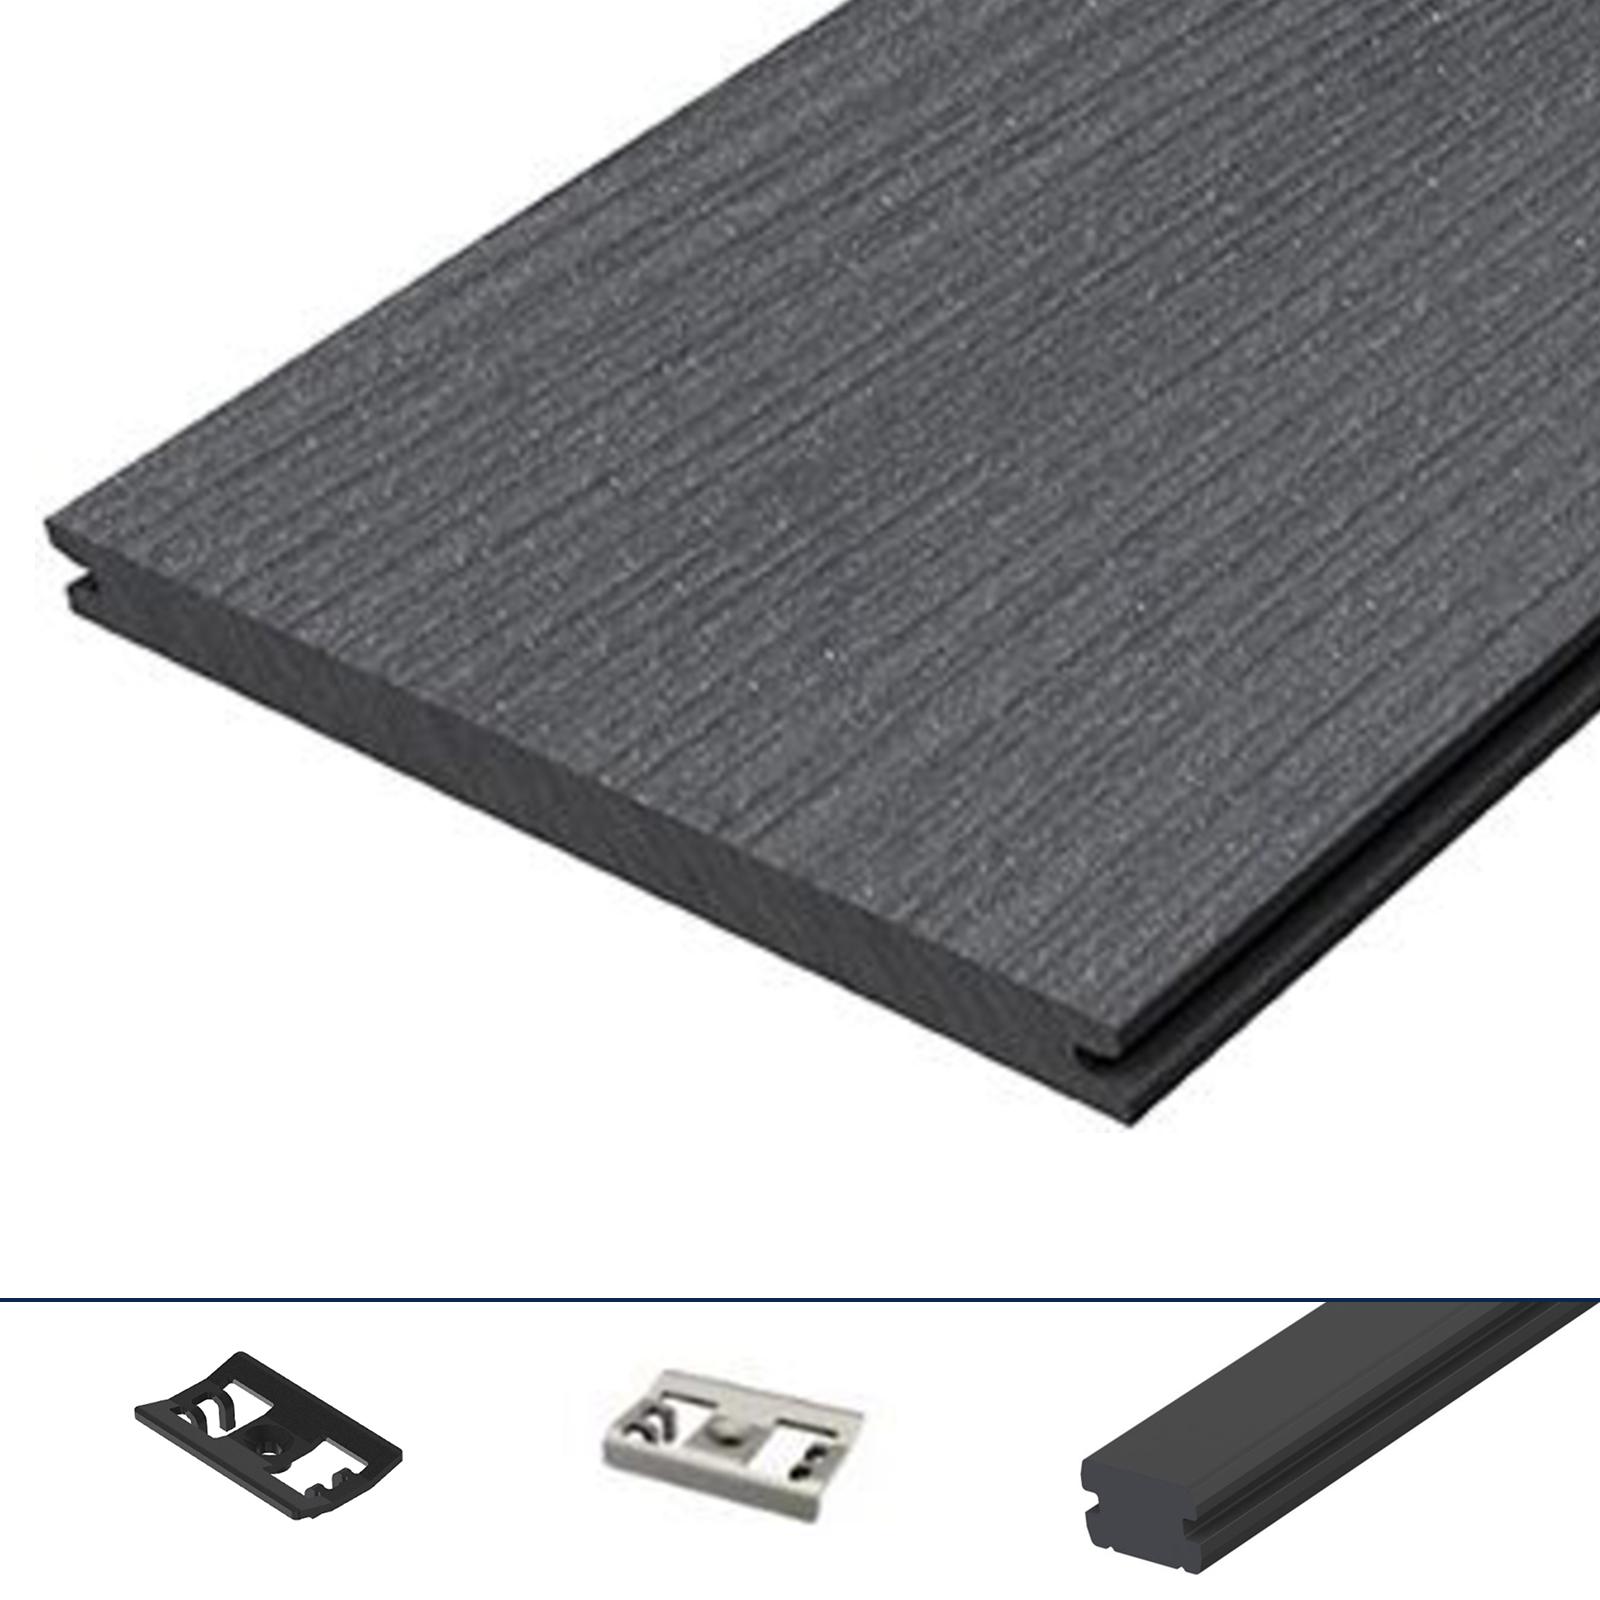 wpc terrassendiele xxl megawood massiv grau komplettset komplettbausatz 5 78 m ebay. Black Bedroom Furniture Sets. Home Design Ideas